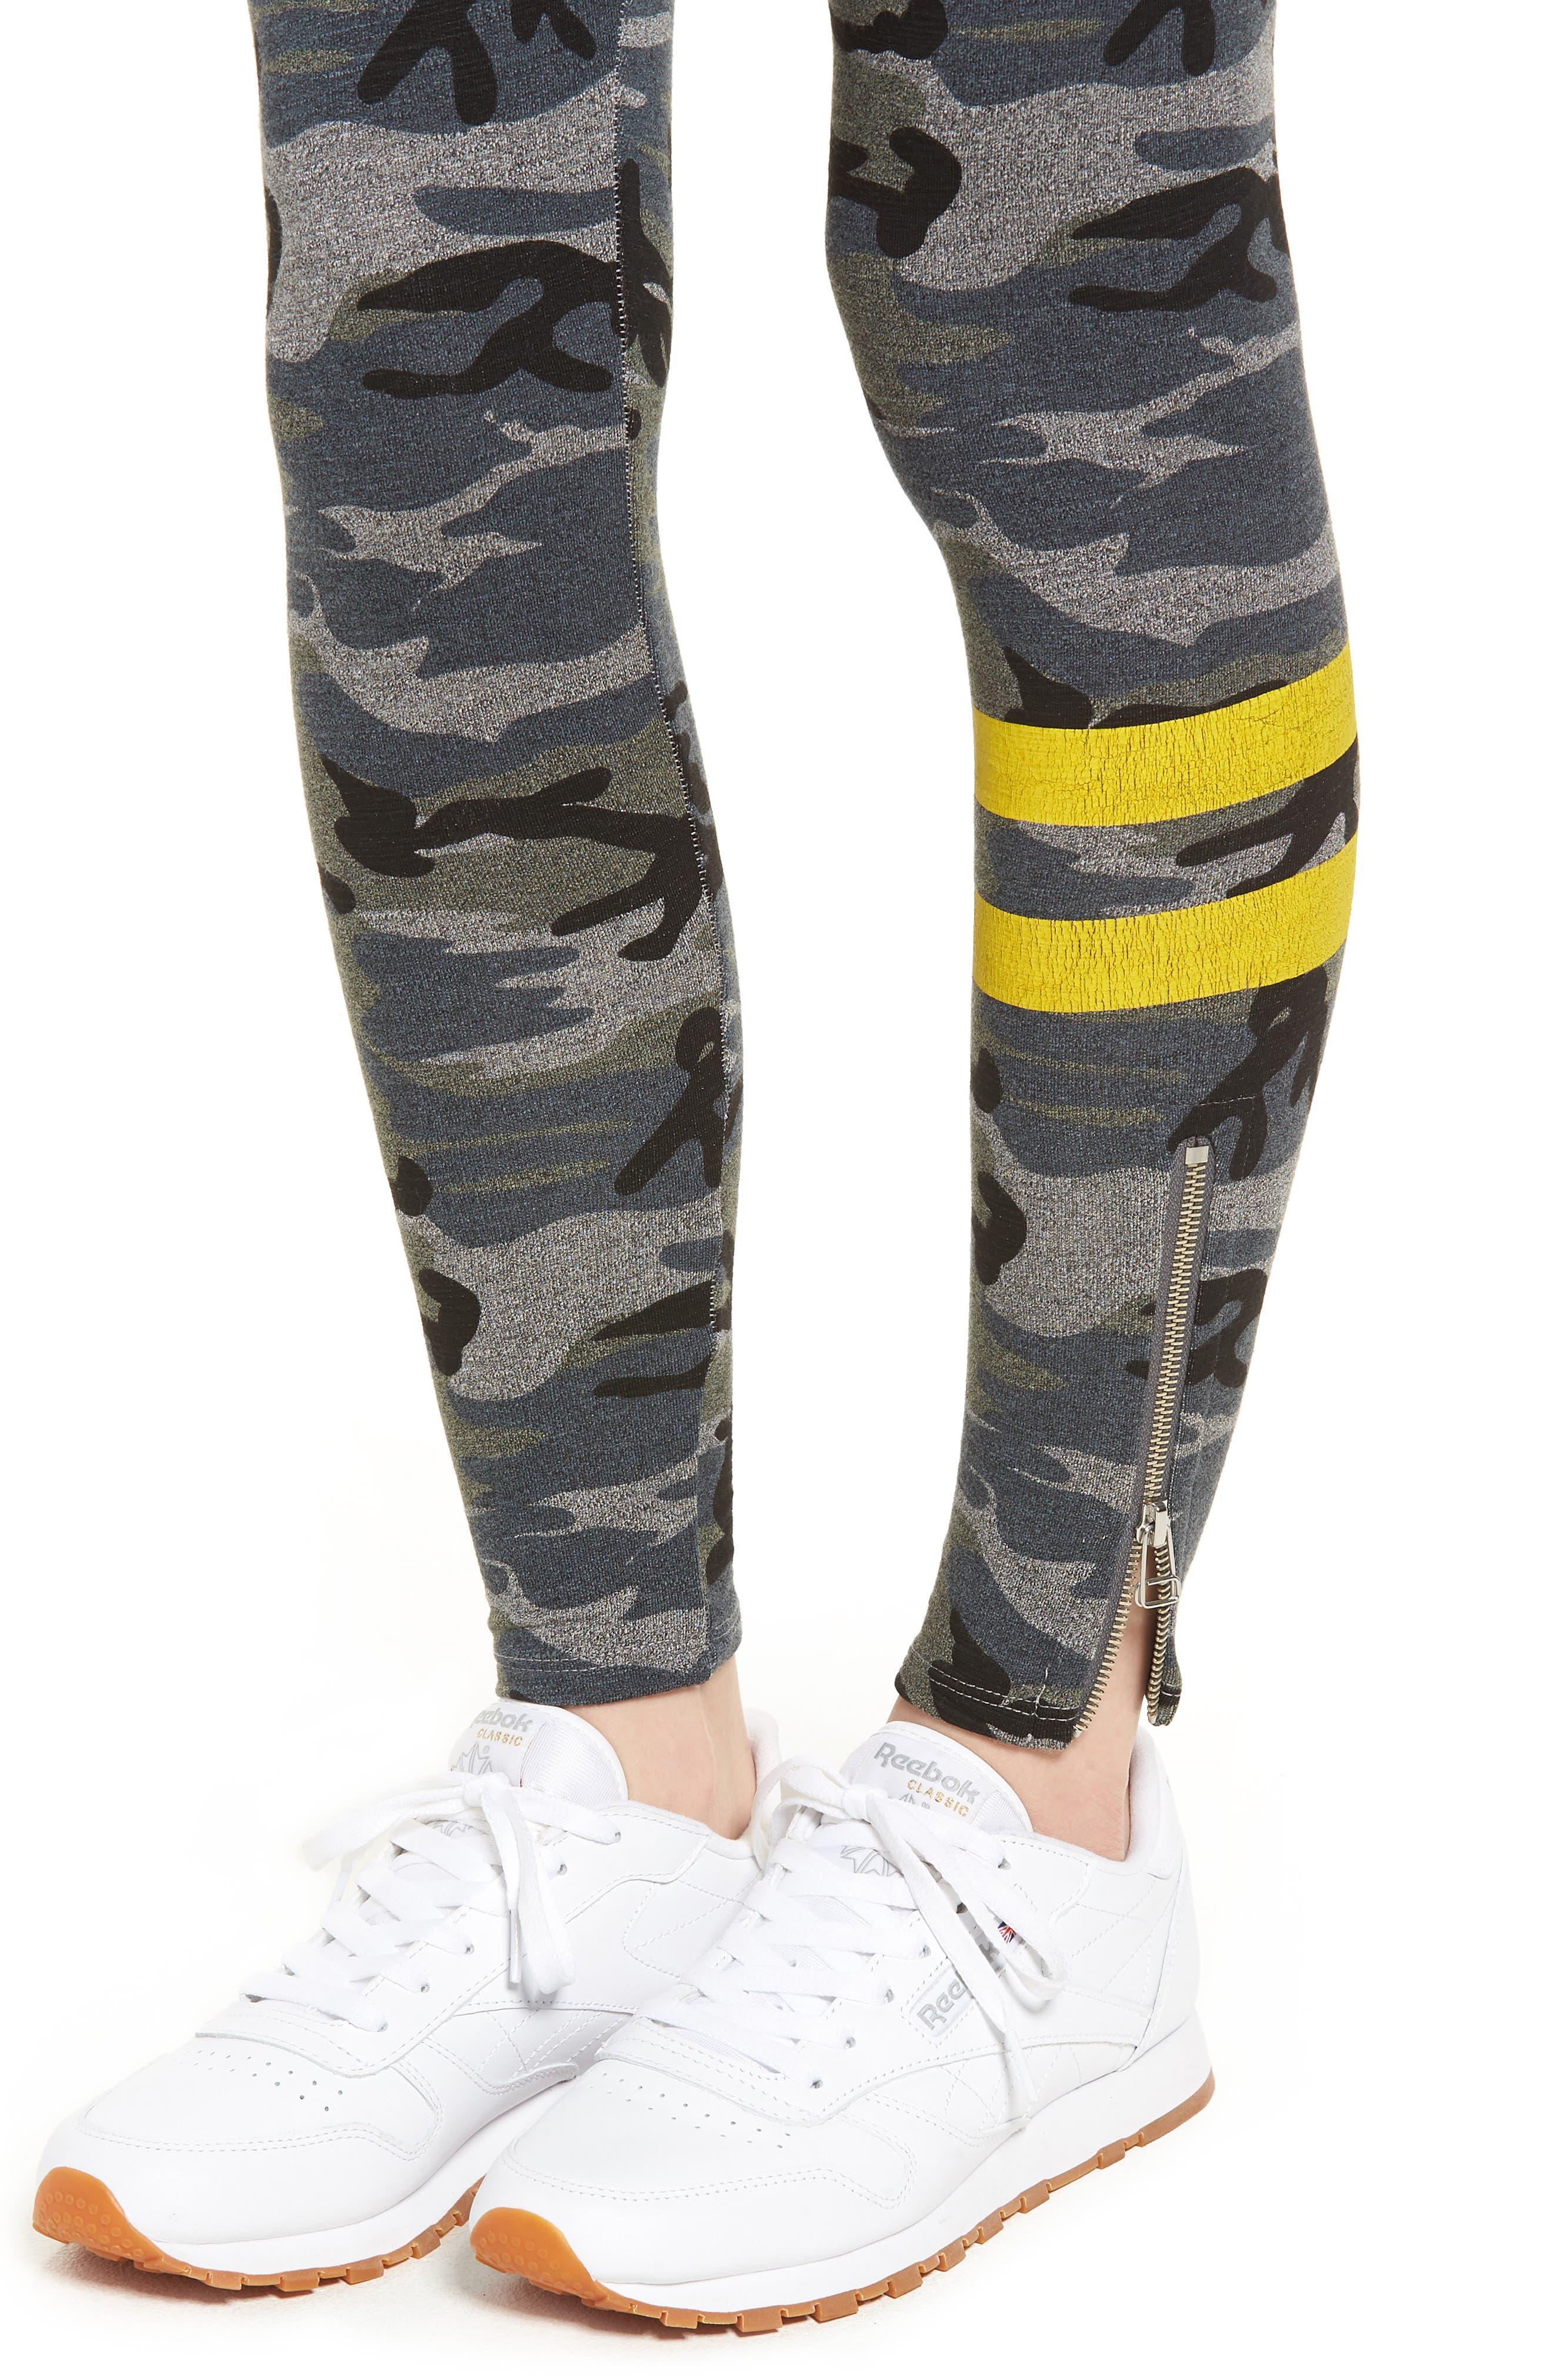 Stripe Camo Yoga Pants,                             Alternate thumbnail 4, color,                             020